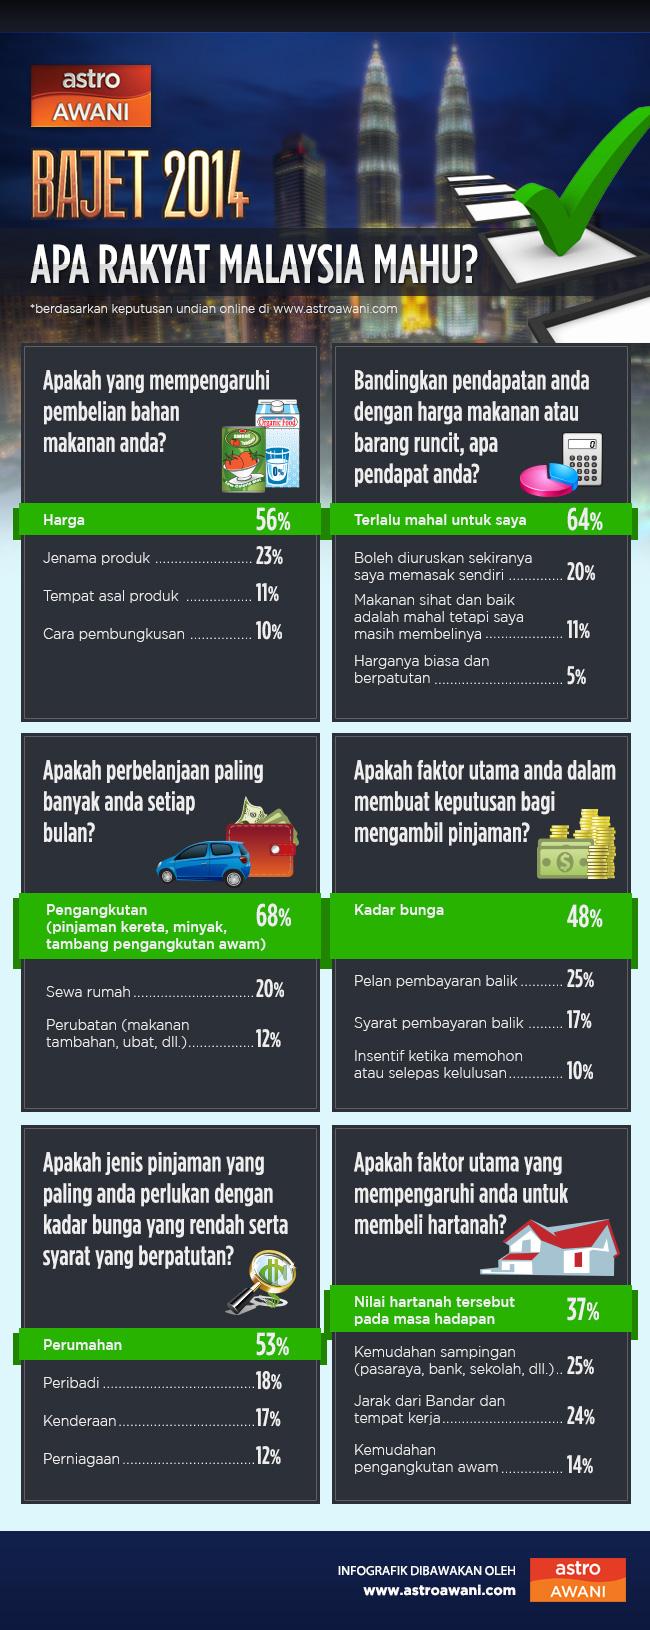 Apa rakyat Malaysia mahu?